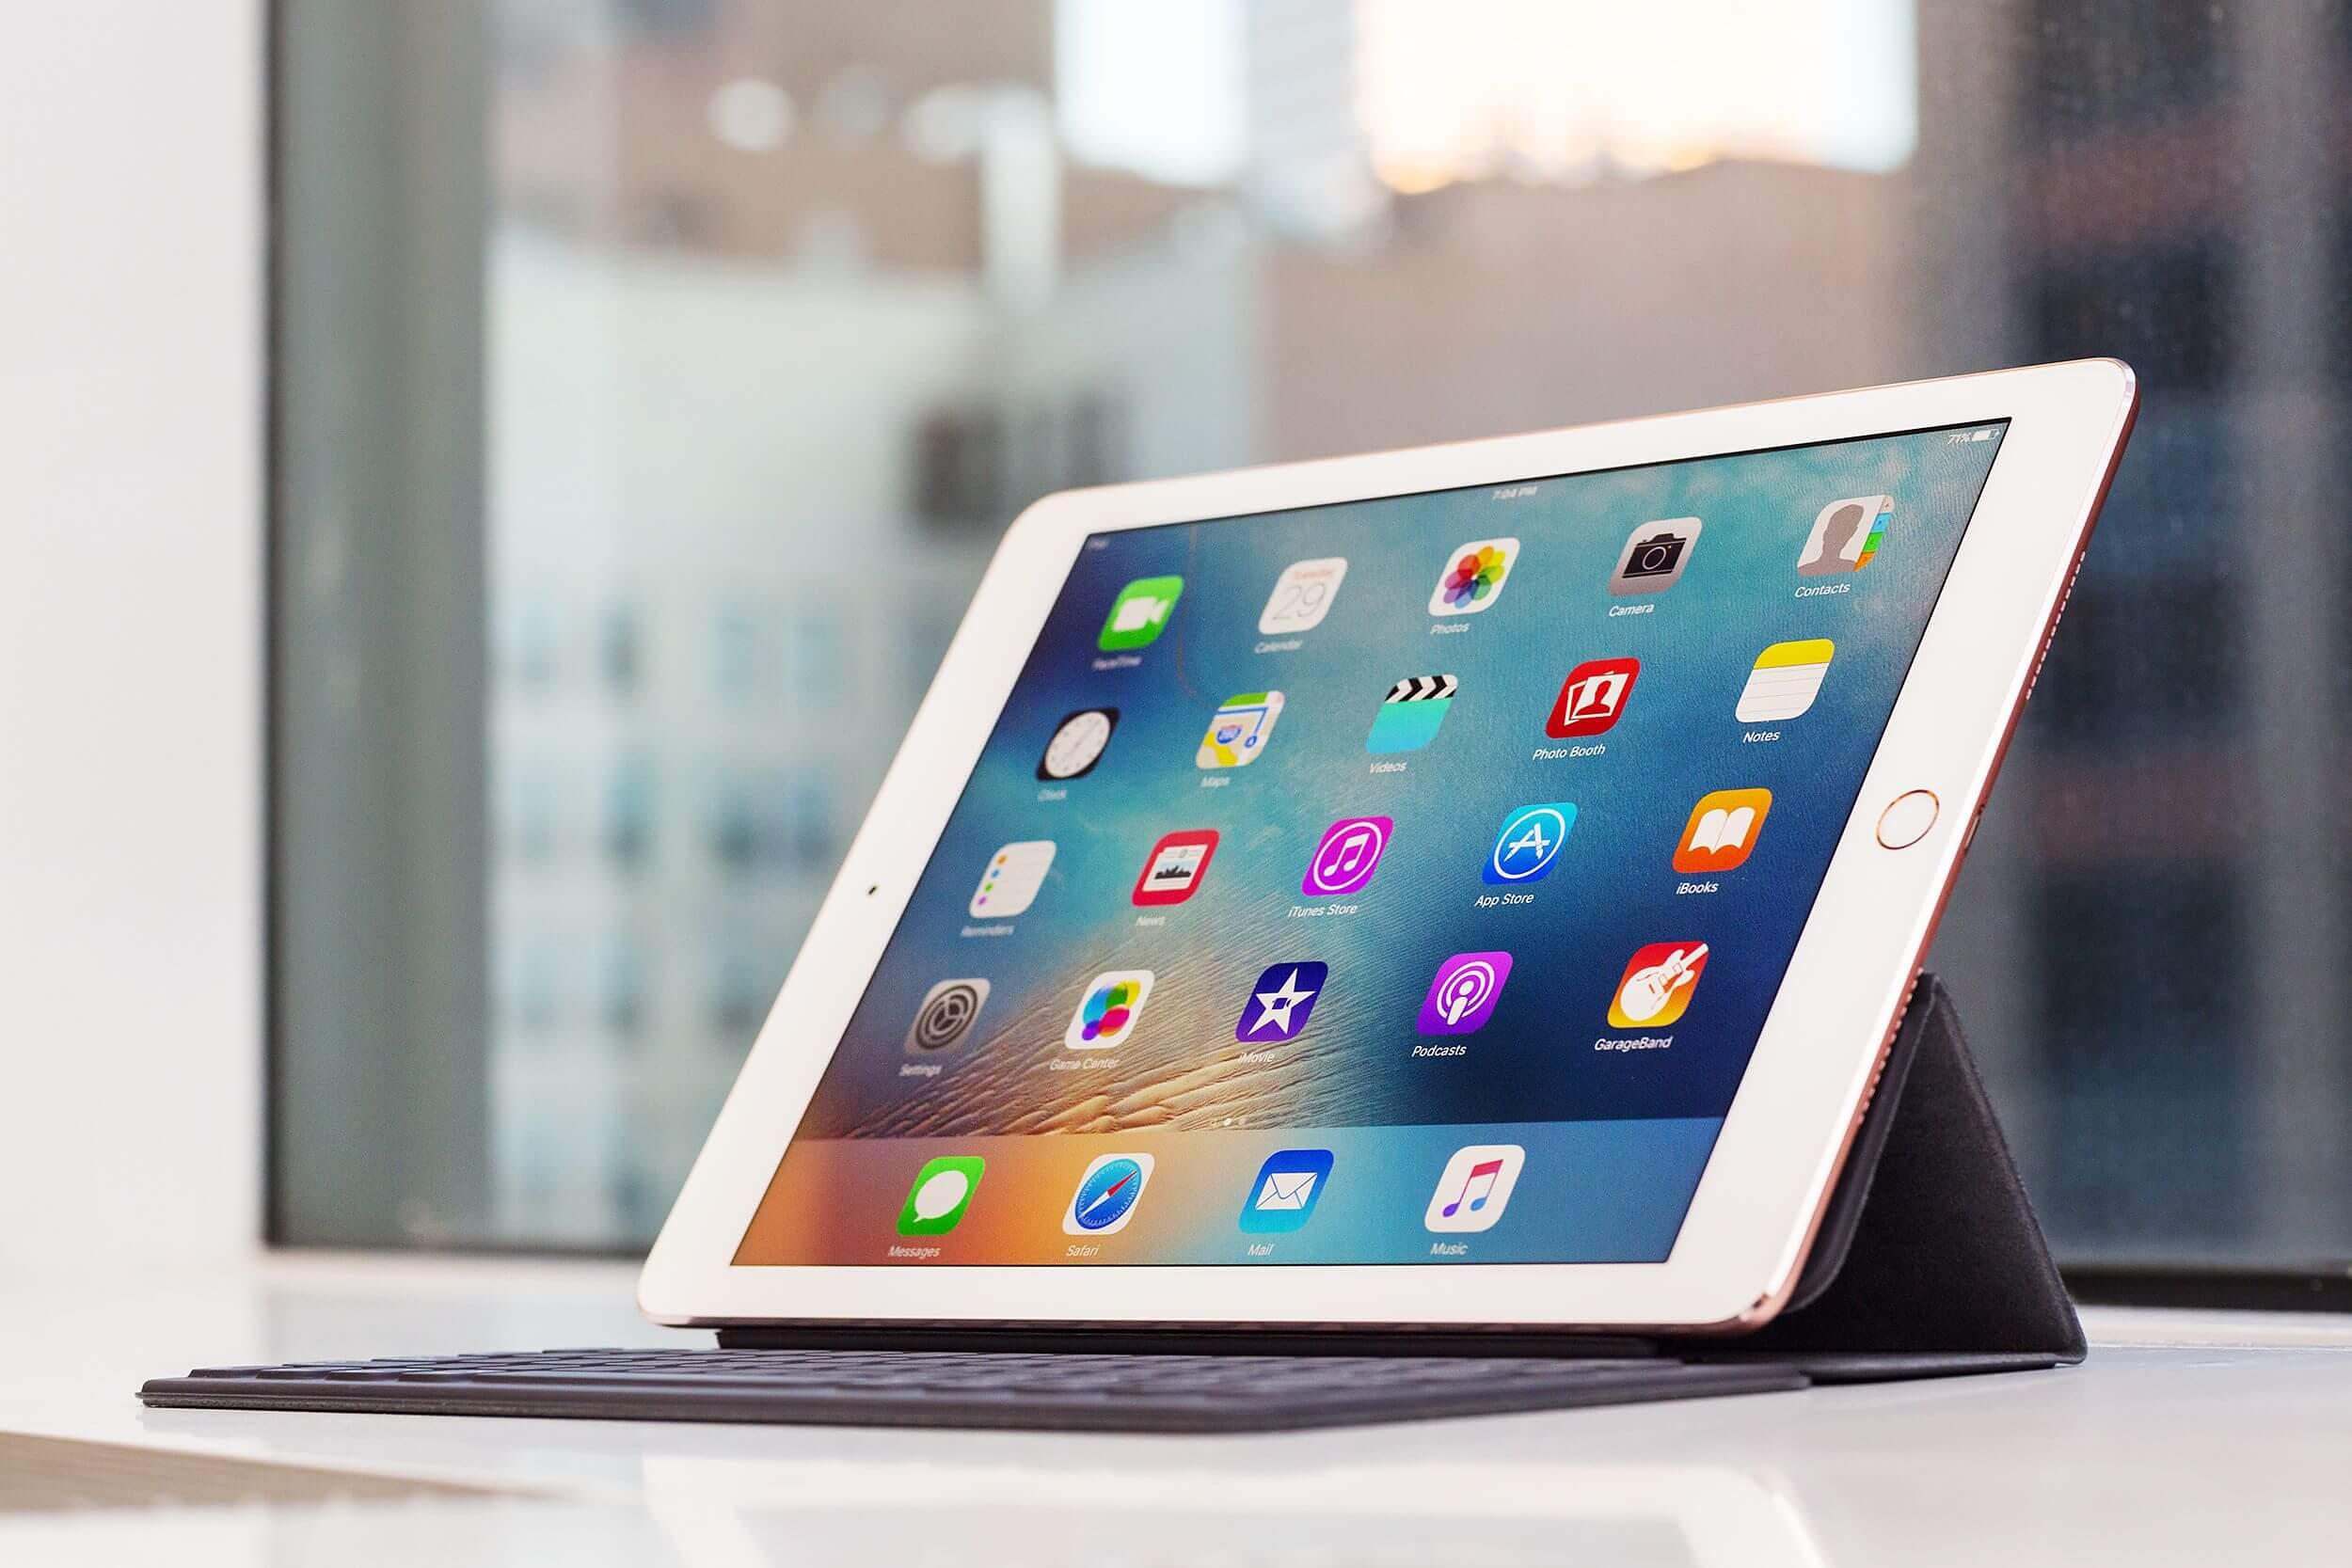 Купить товар Топ Винтаж London газета защитный чехол для планшета Чехол для iPad Air 2 Mini 2 4 в